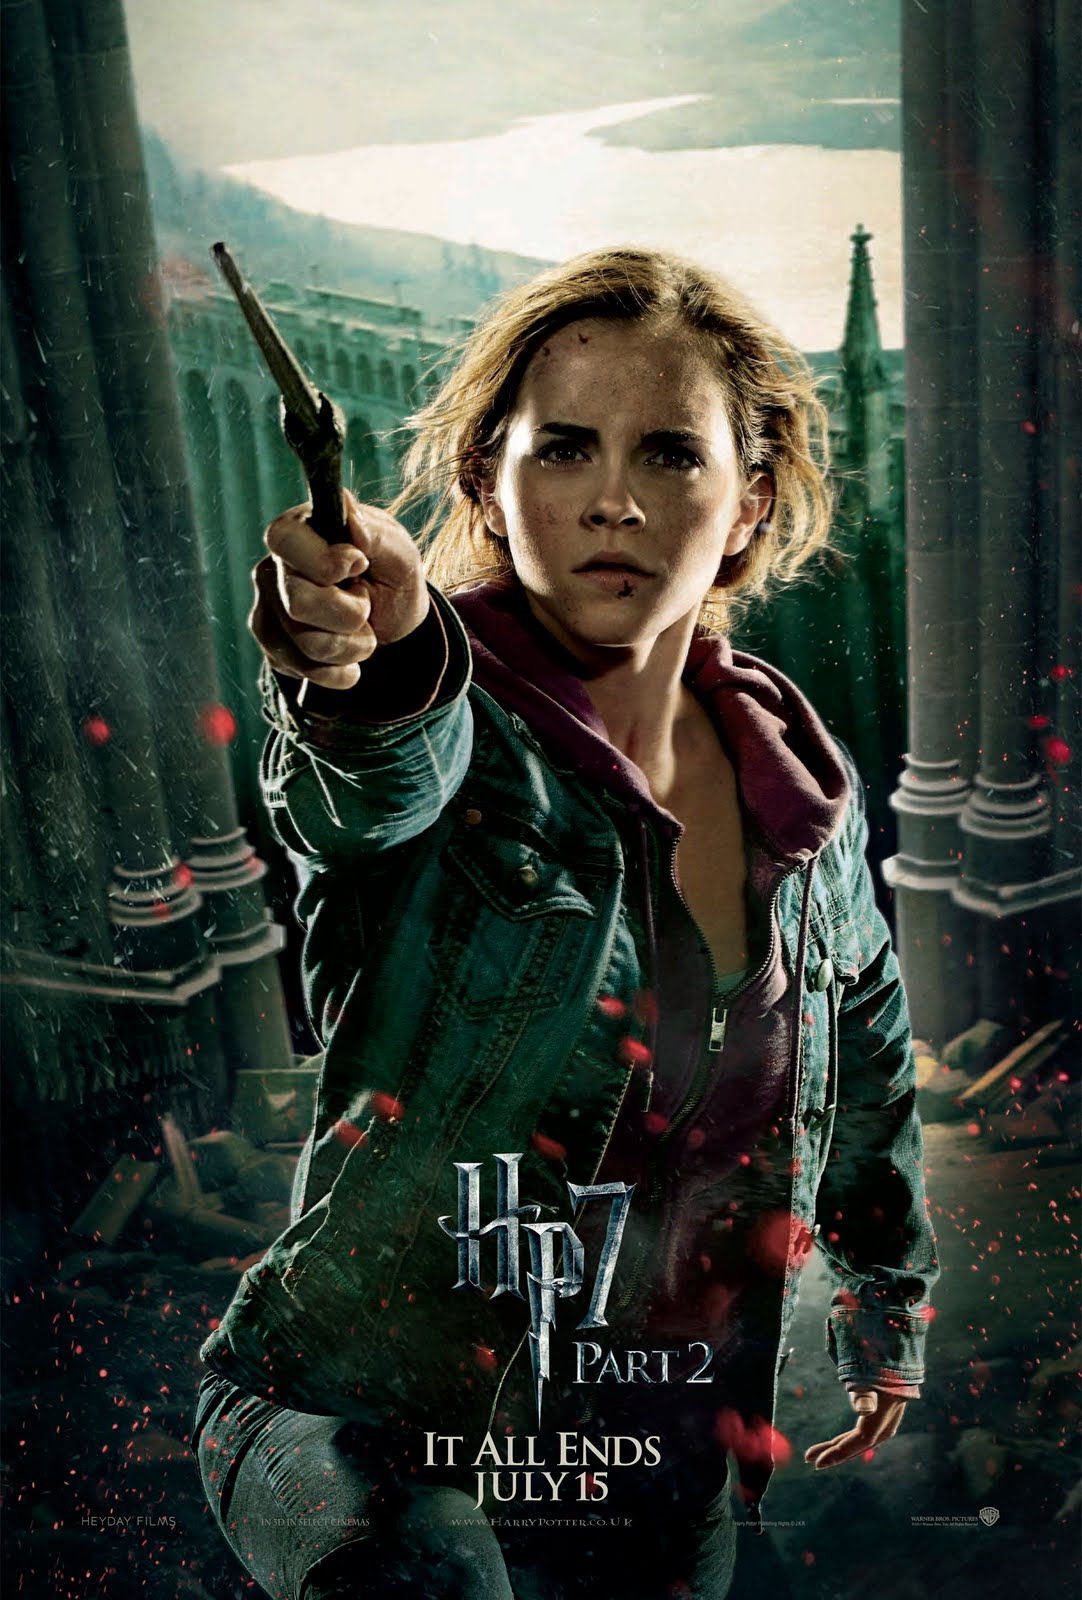 http://4.bp.blogspot.com/-7XRzIorcbD0/TfAN-y4ORKI/AAAAAAAAQQY/UyltP-bJVbs/s1600/HP7-2_ACTION_Hermione_INTL.jpg